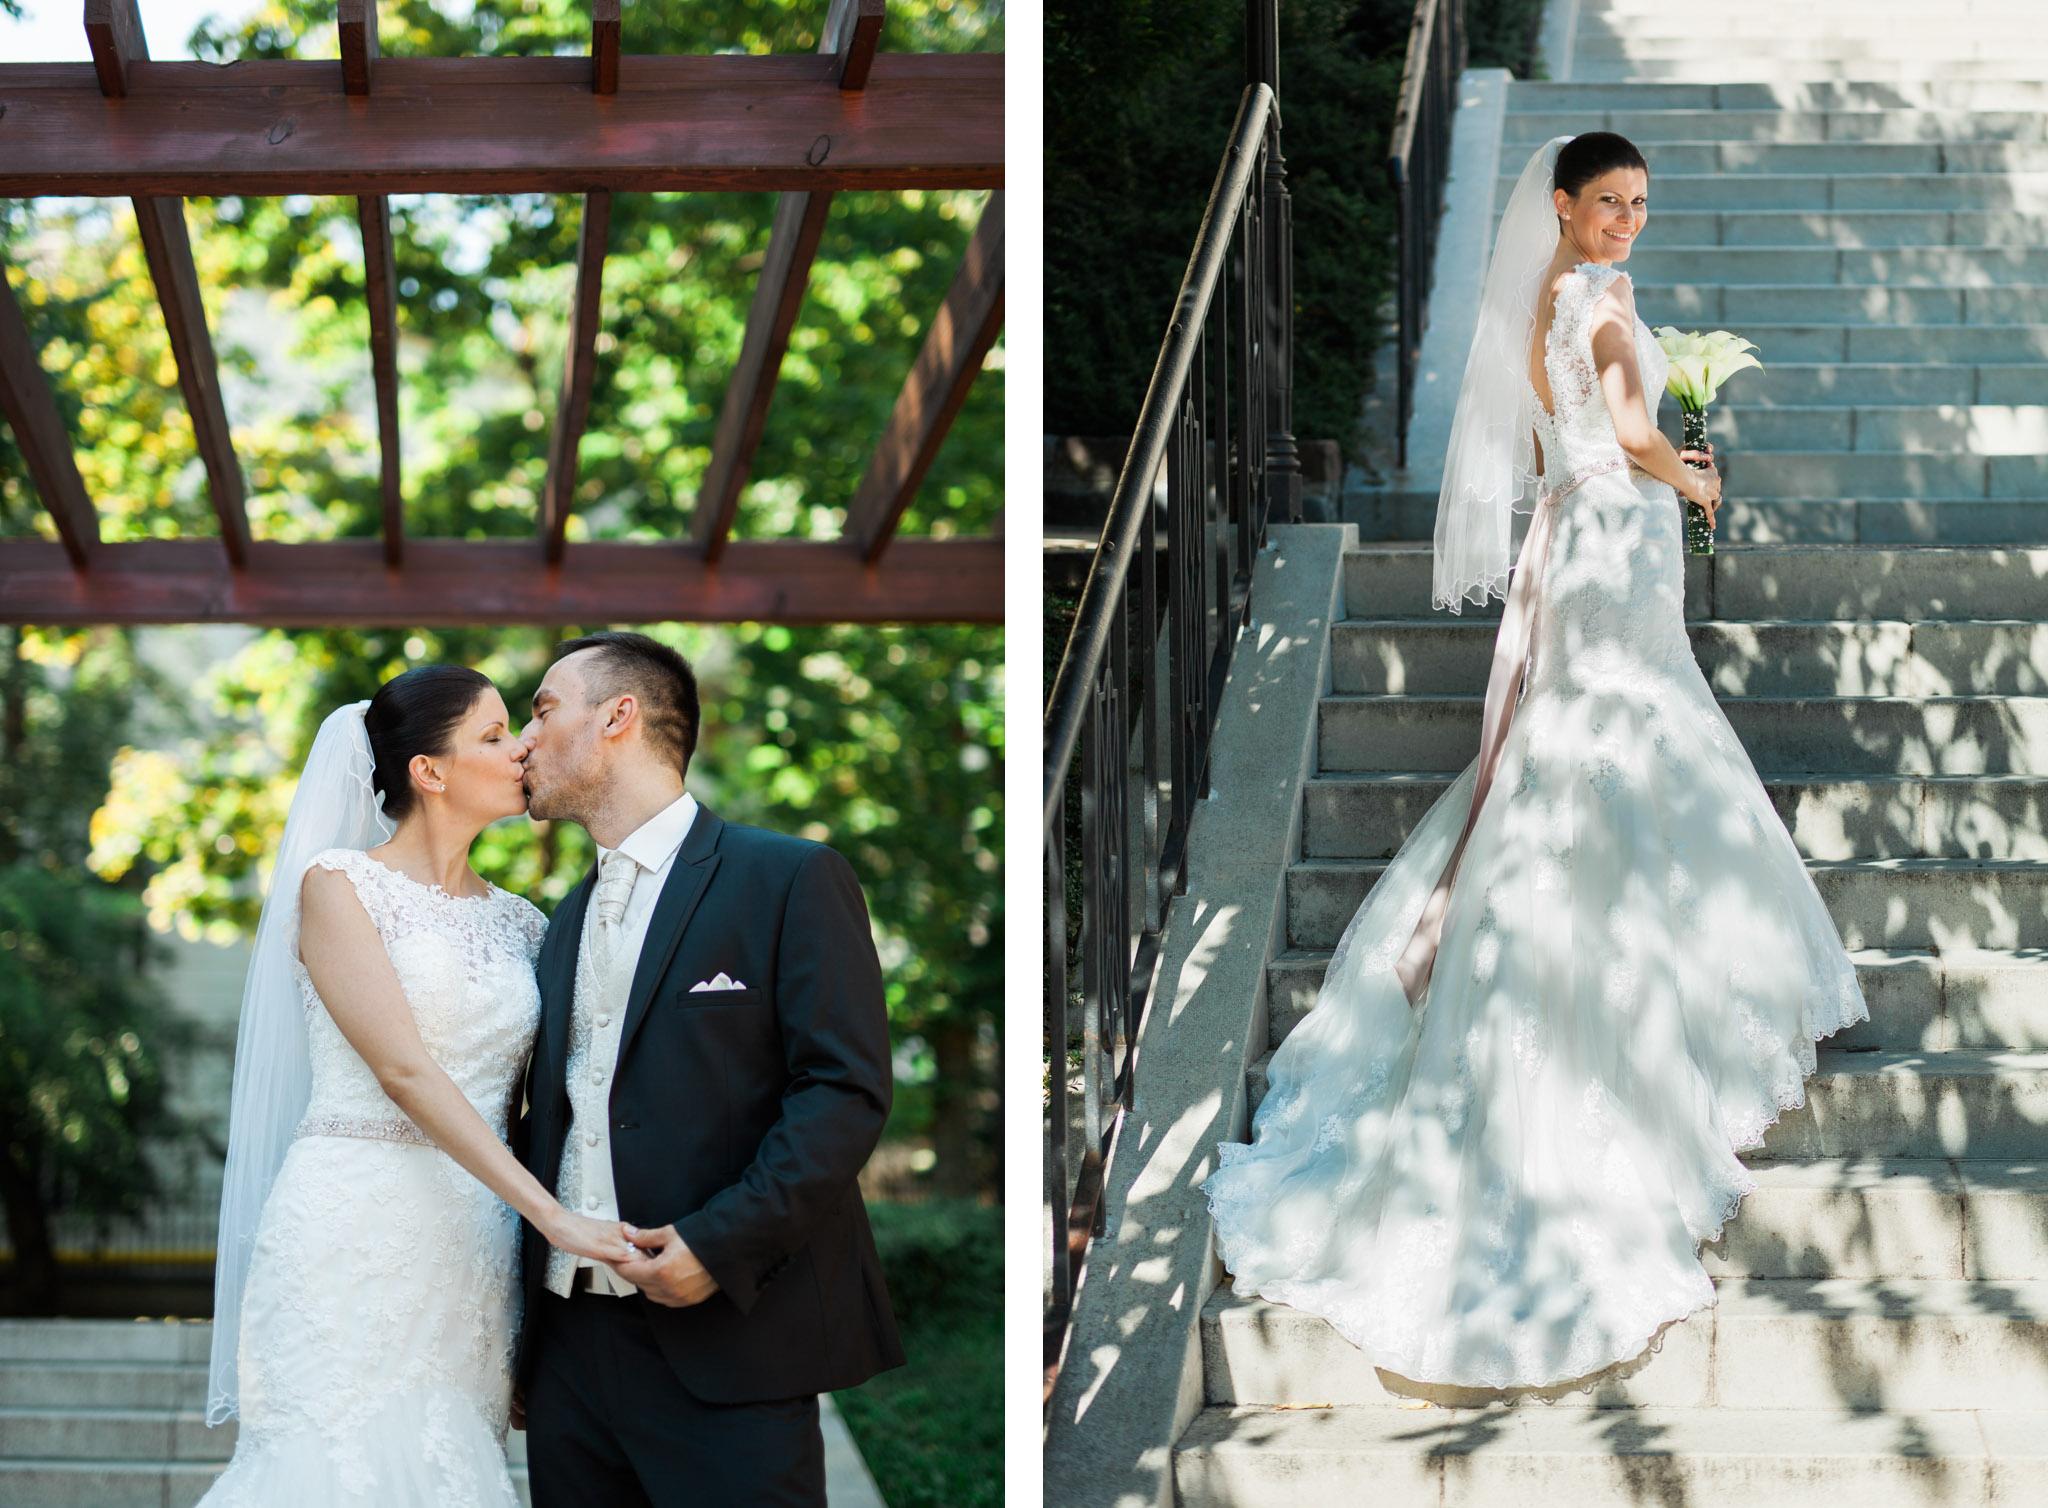 eskuvo_fotozas_wedding_foto_lenart_gabor_sztyui_budapest_IMG_5579